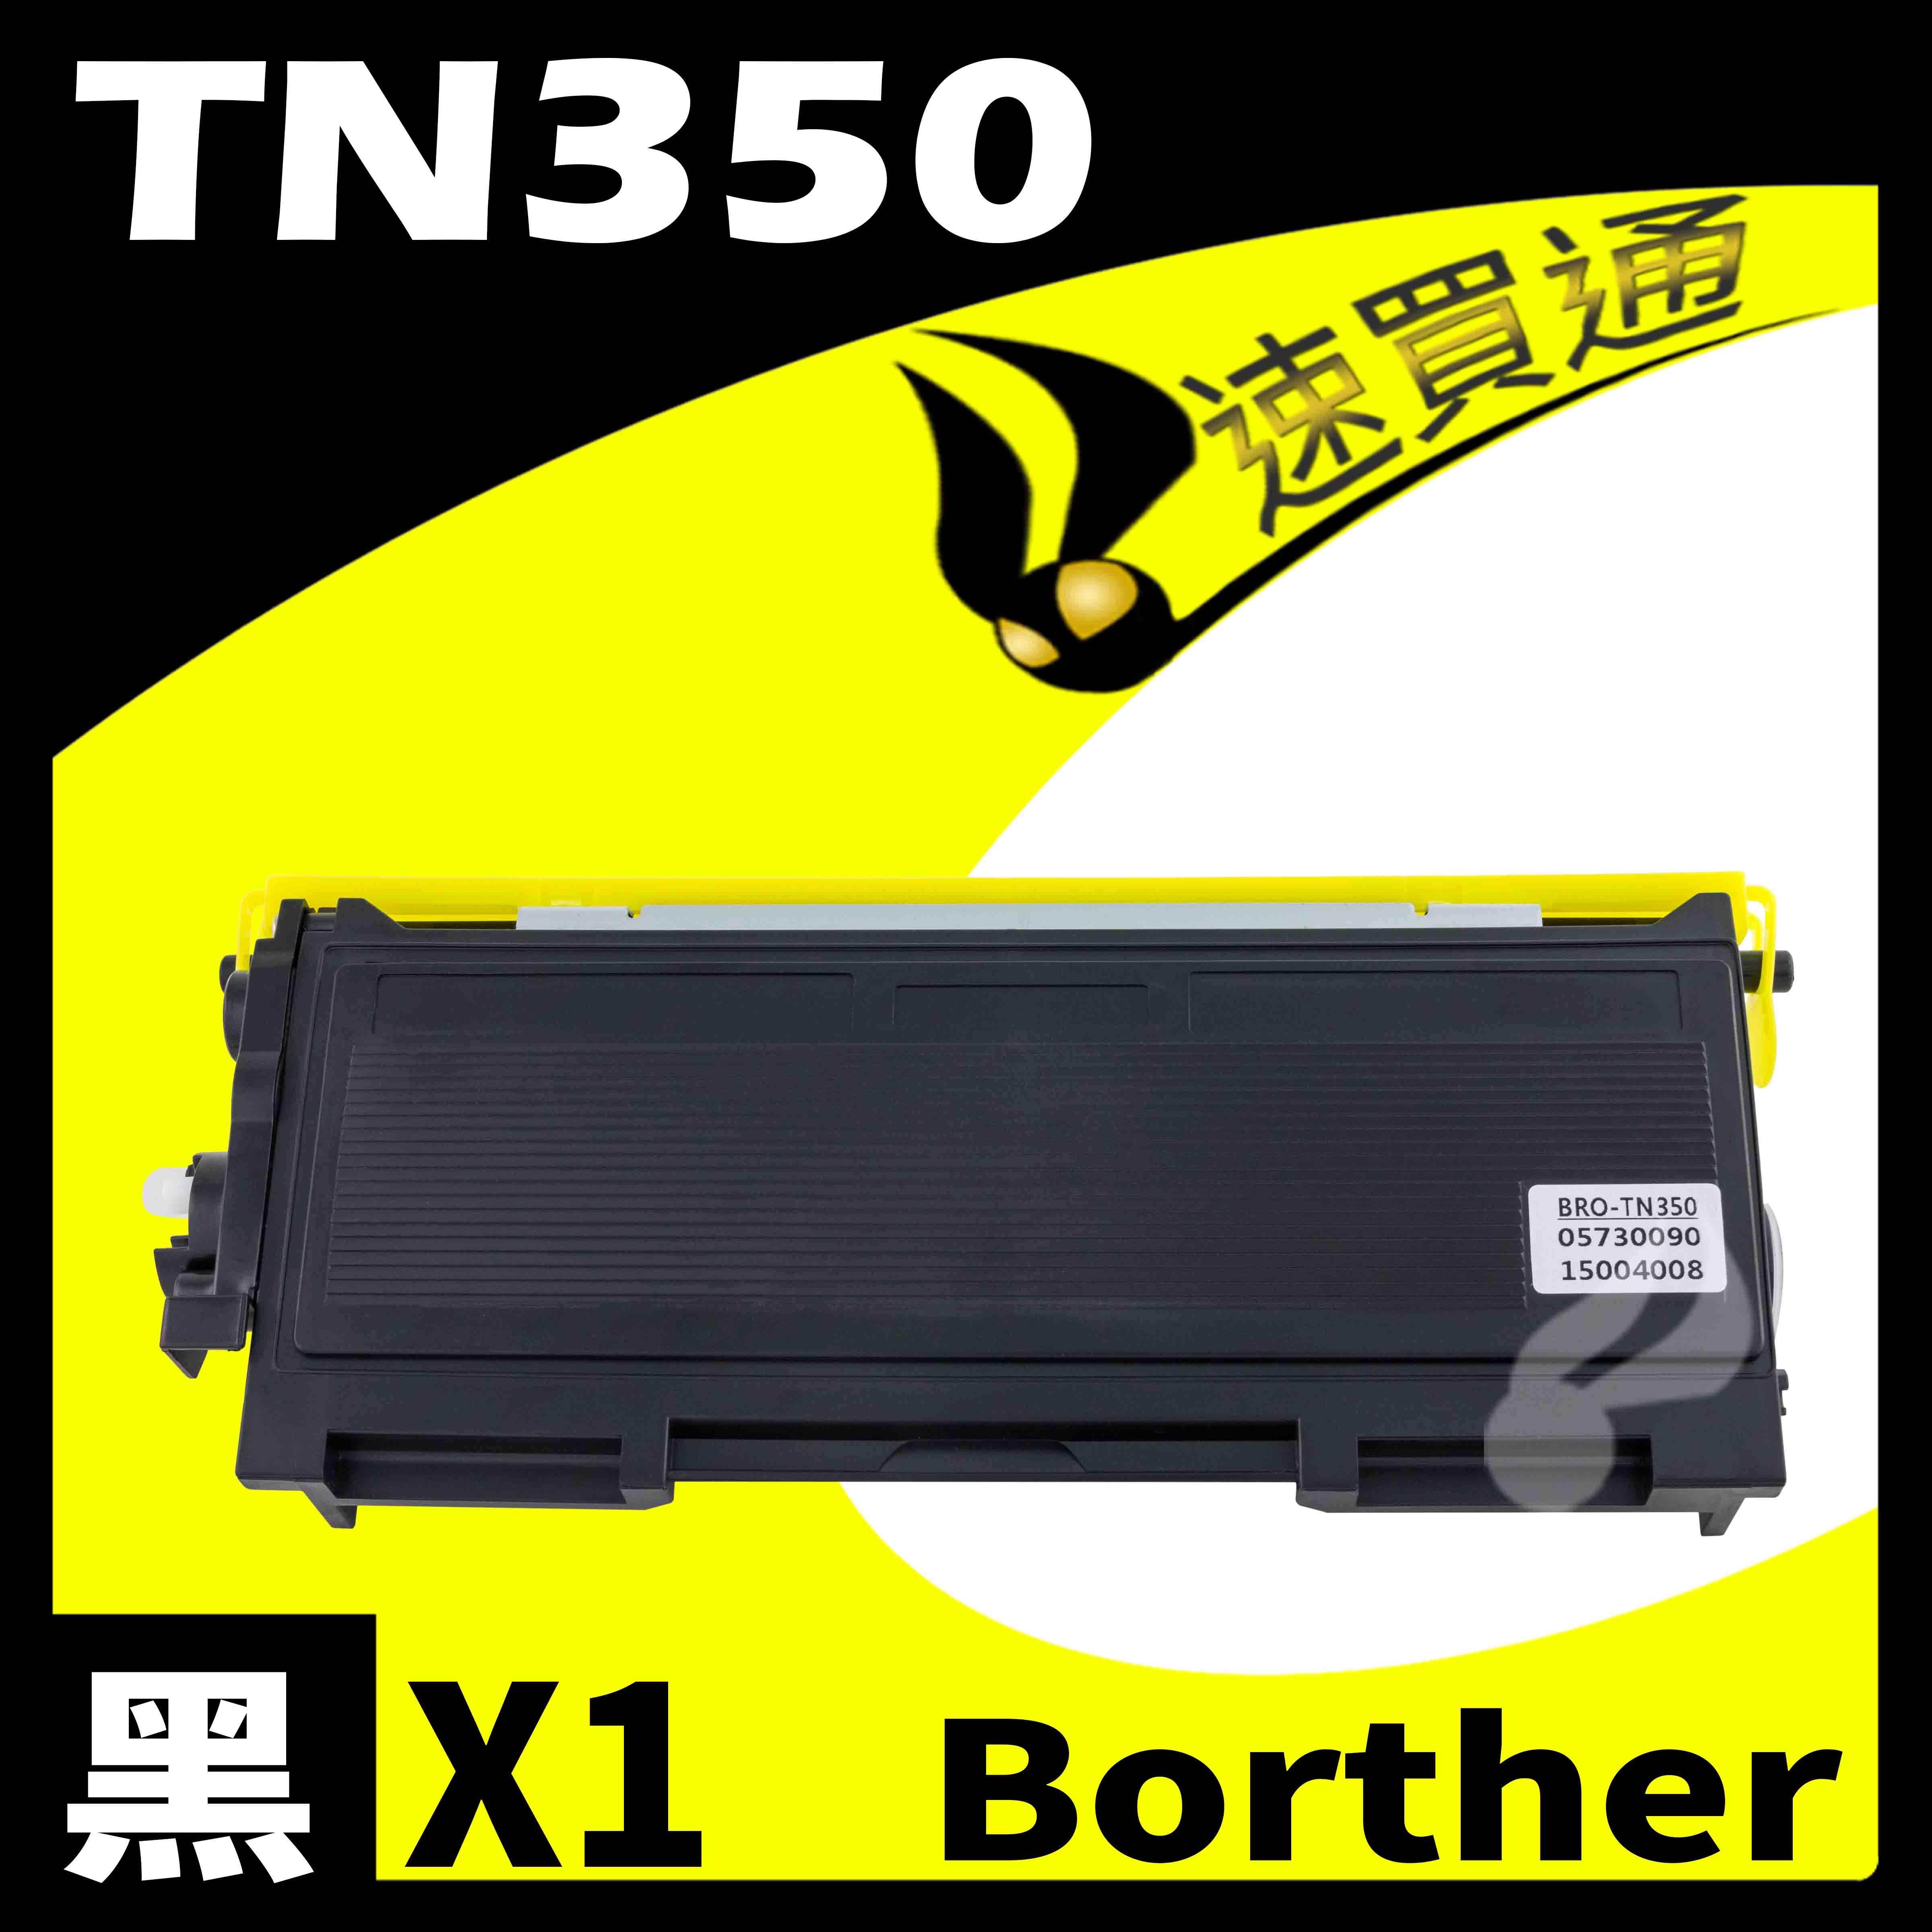 tw-smile 【速買通】Brother TN-350/ TN350 相容碳粉匣